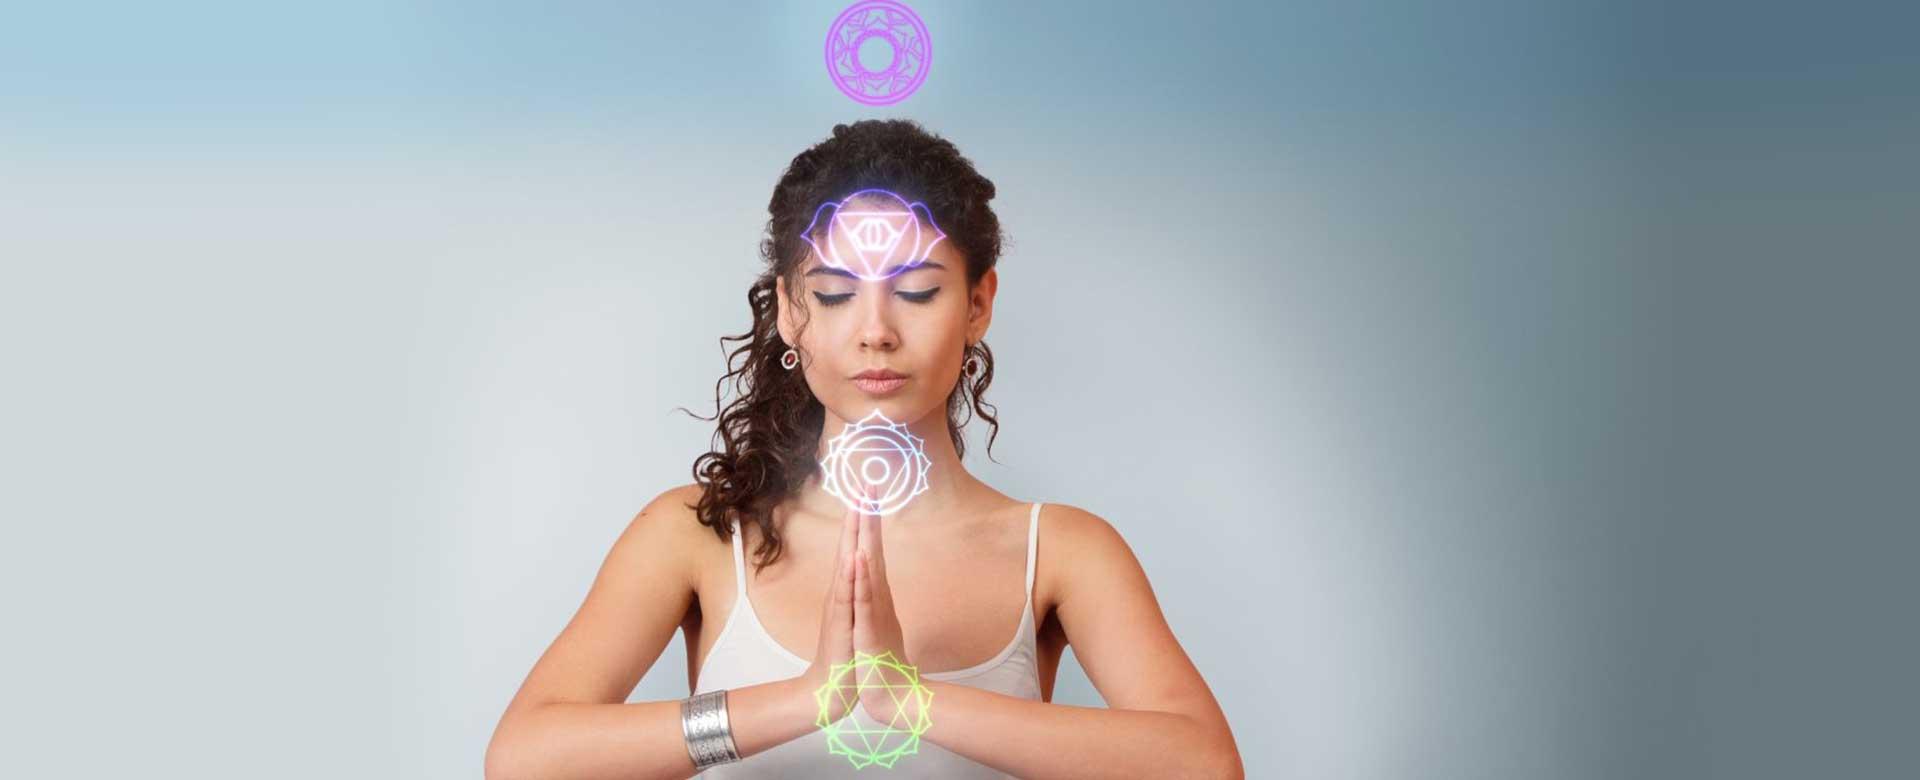 Transcendental Or Samadhi Meditation, Home of Wellness